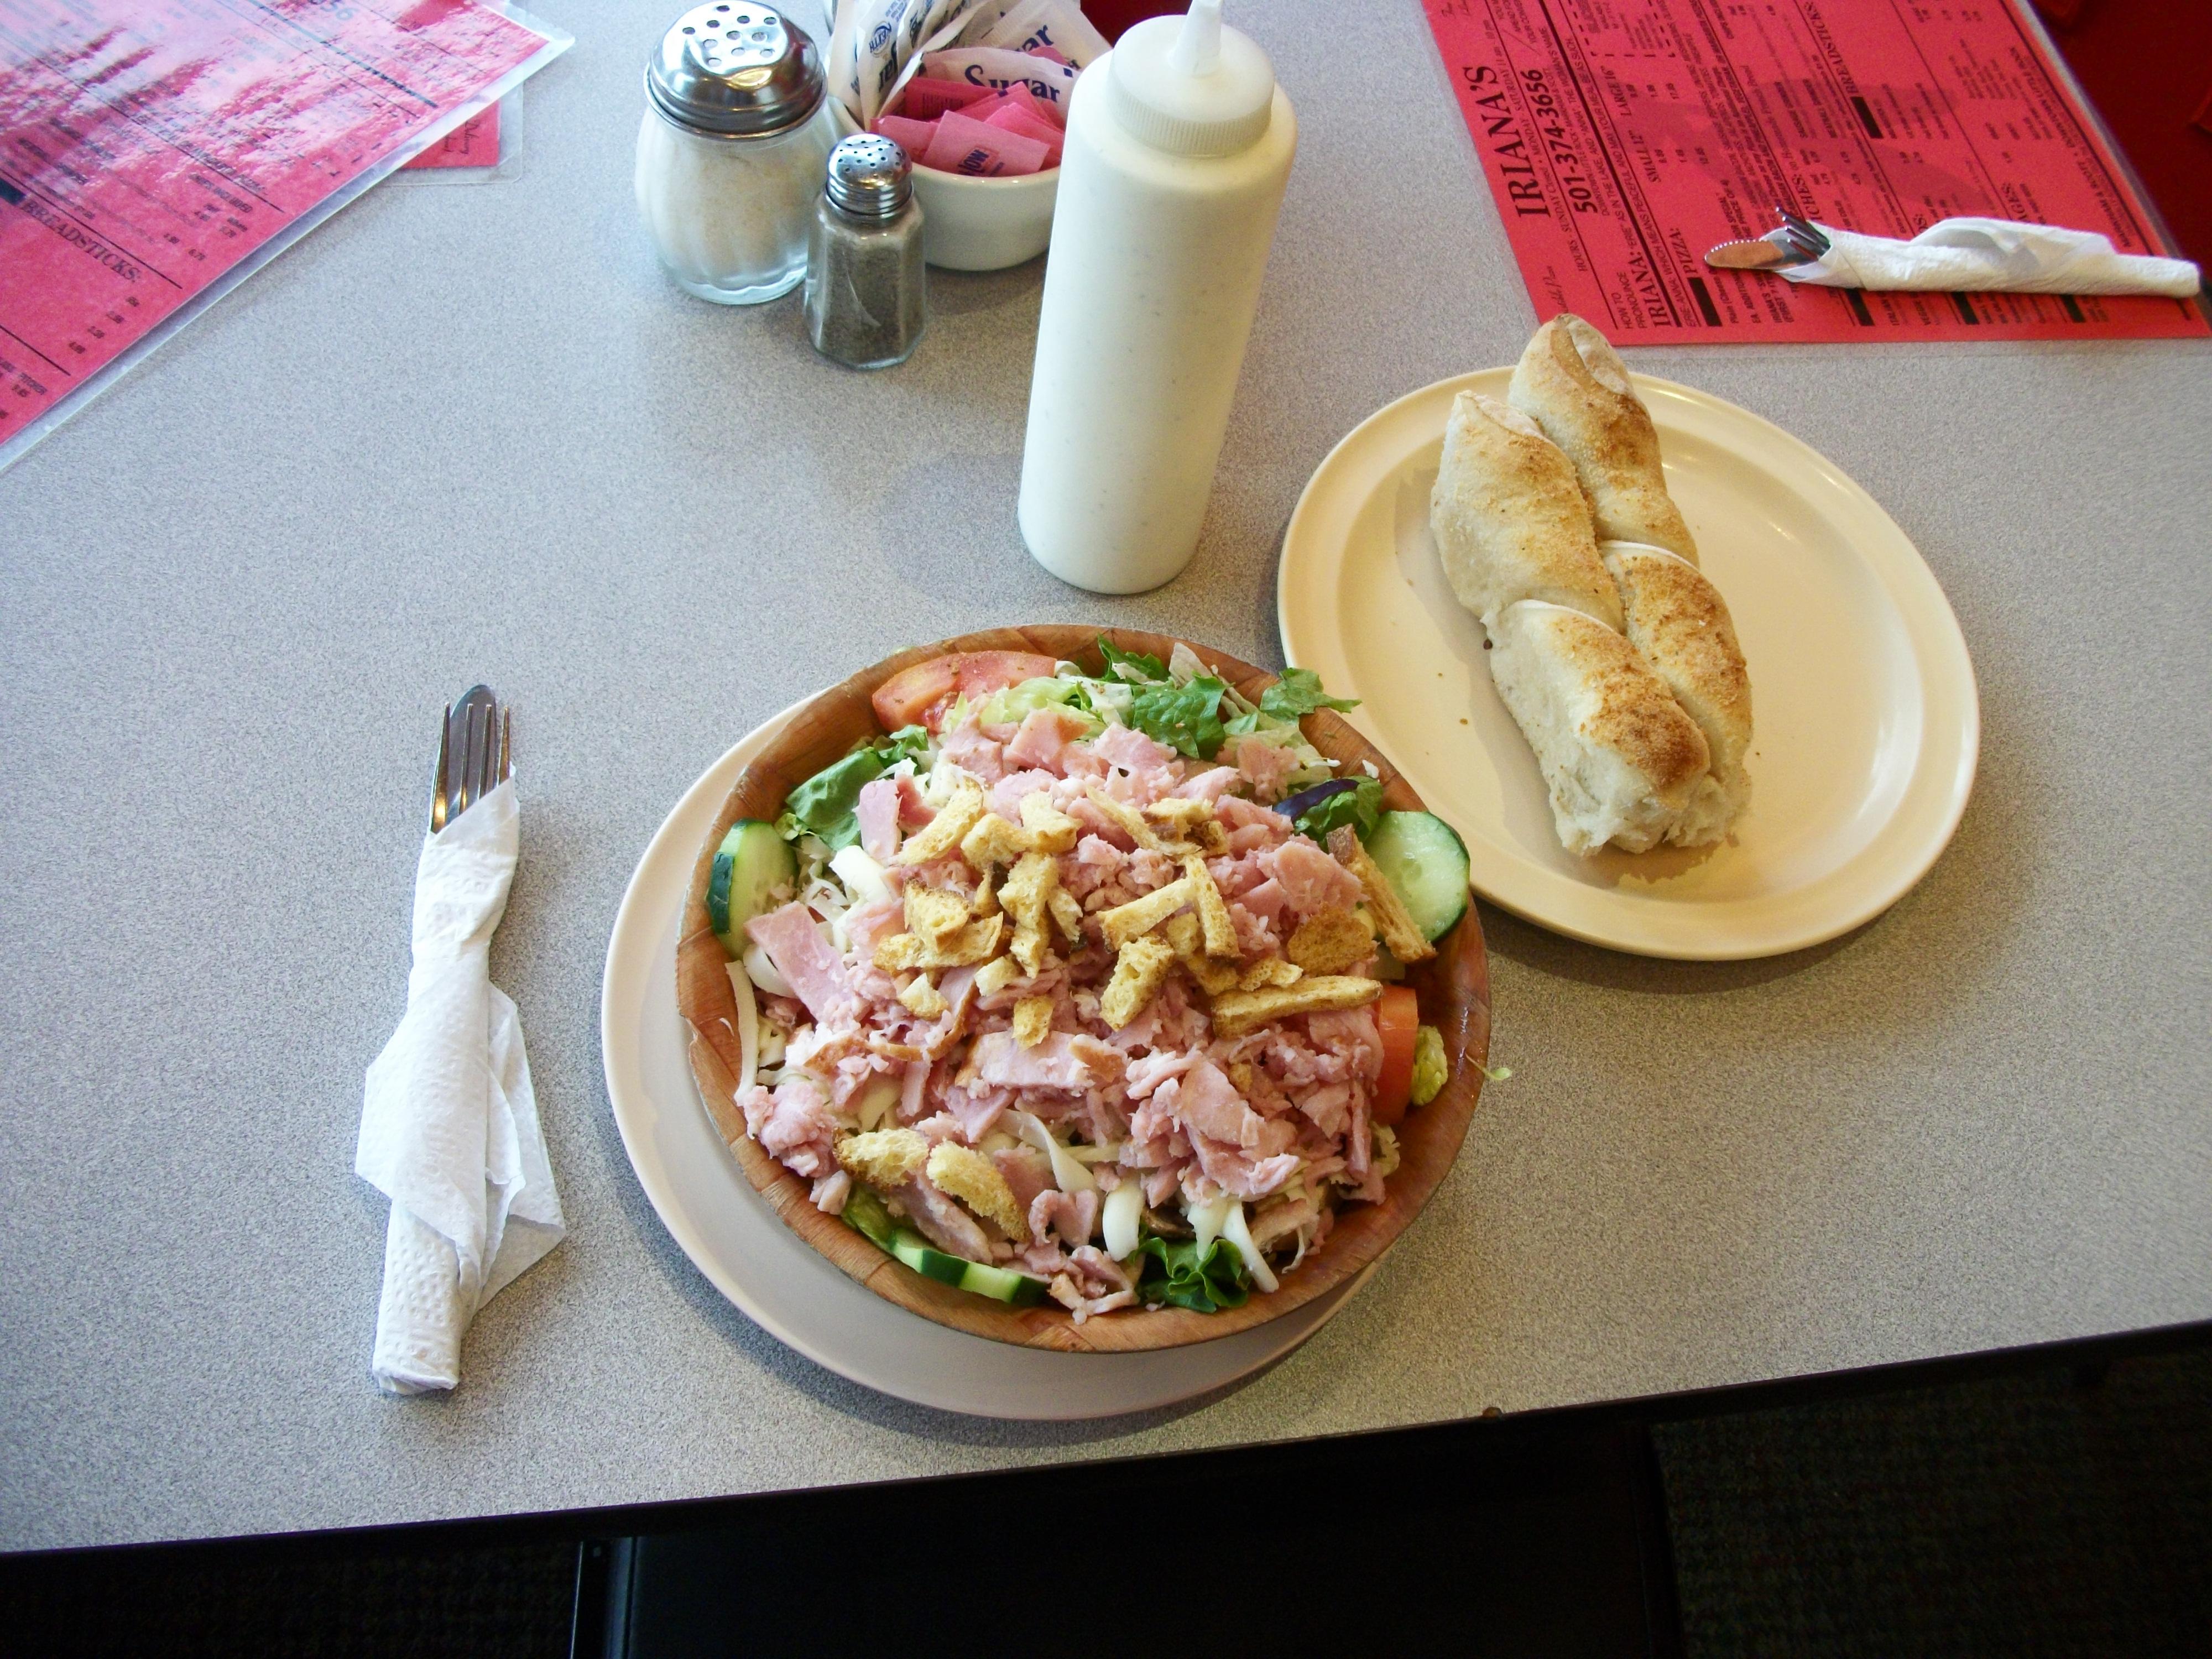 Big Salad with Ham added